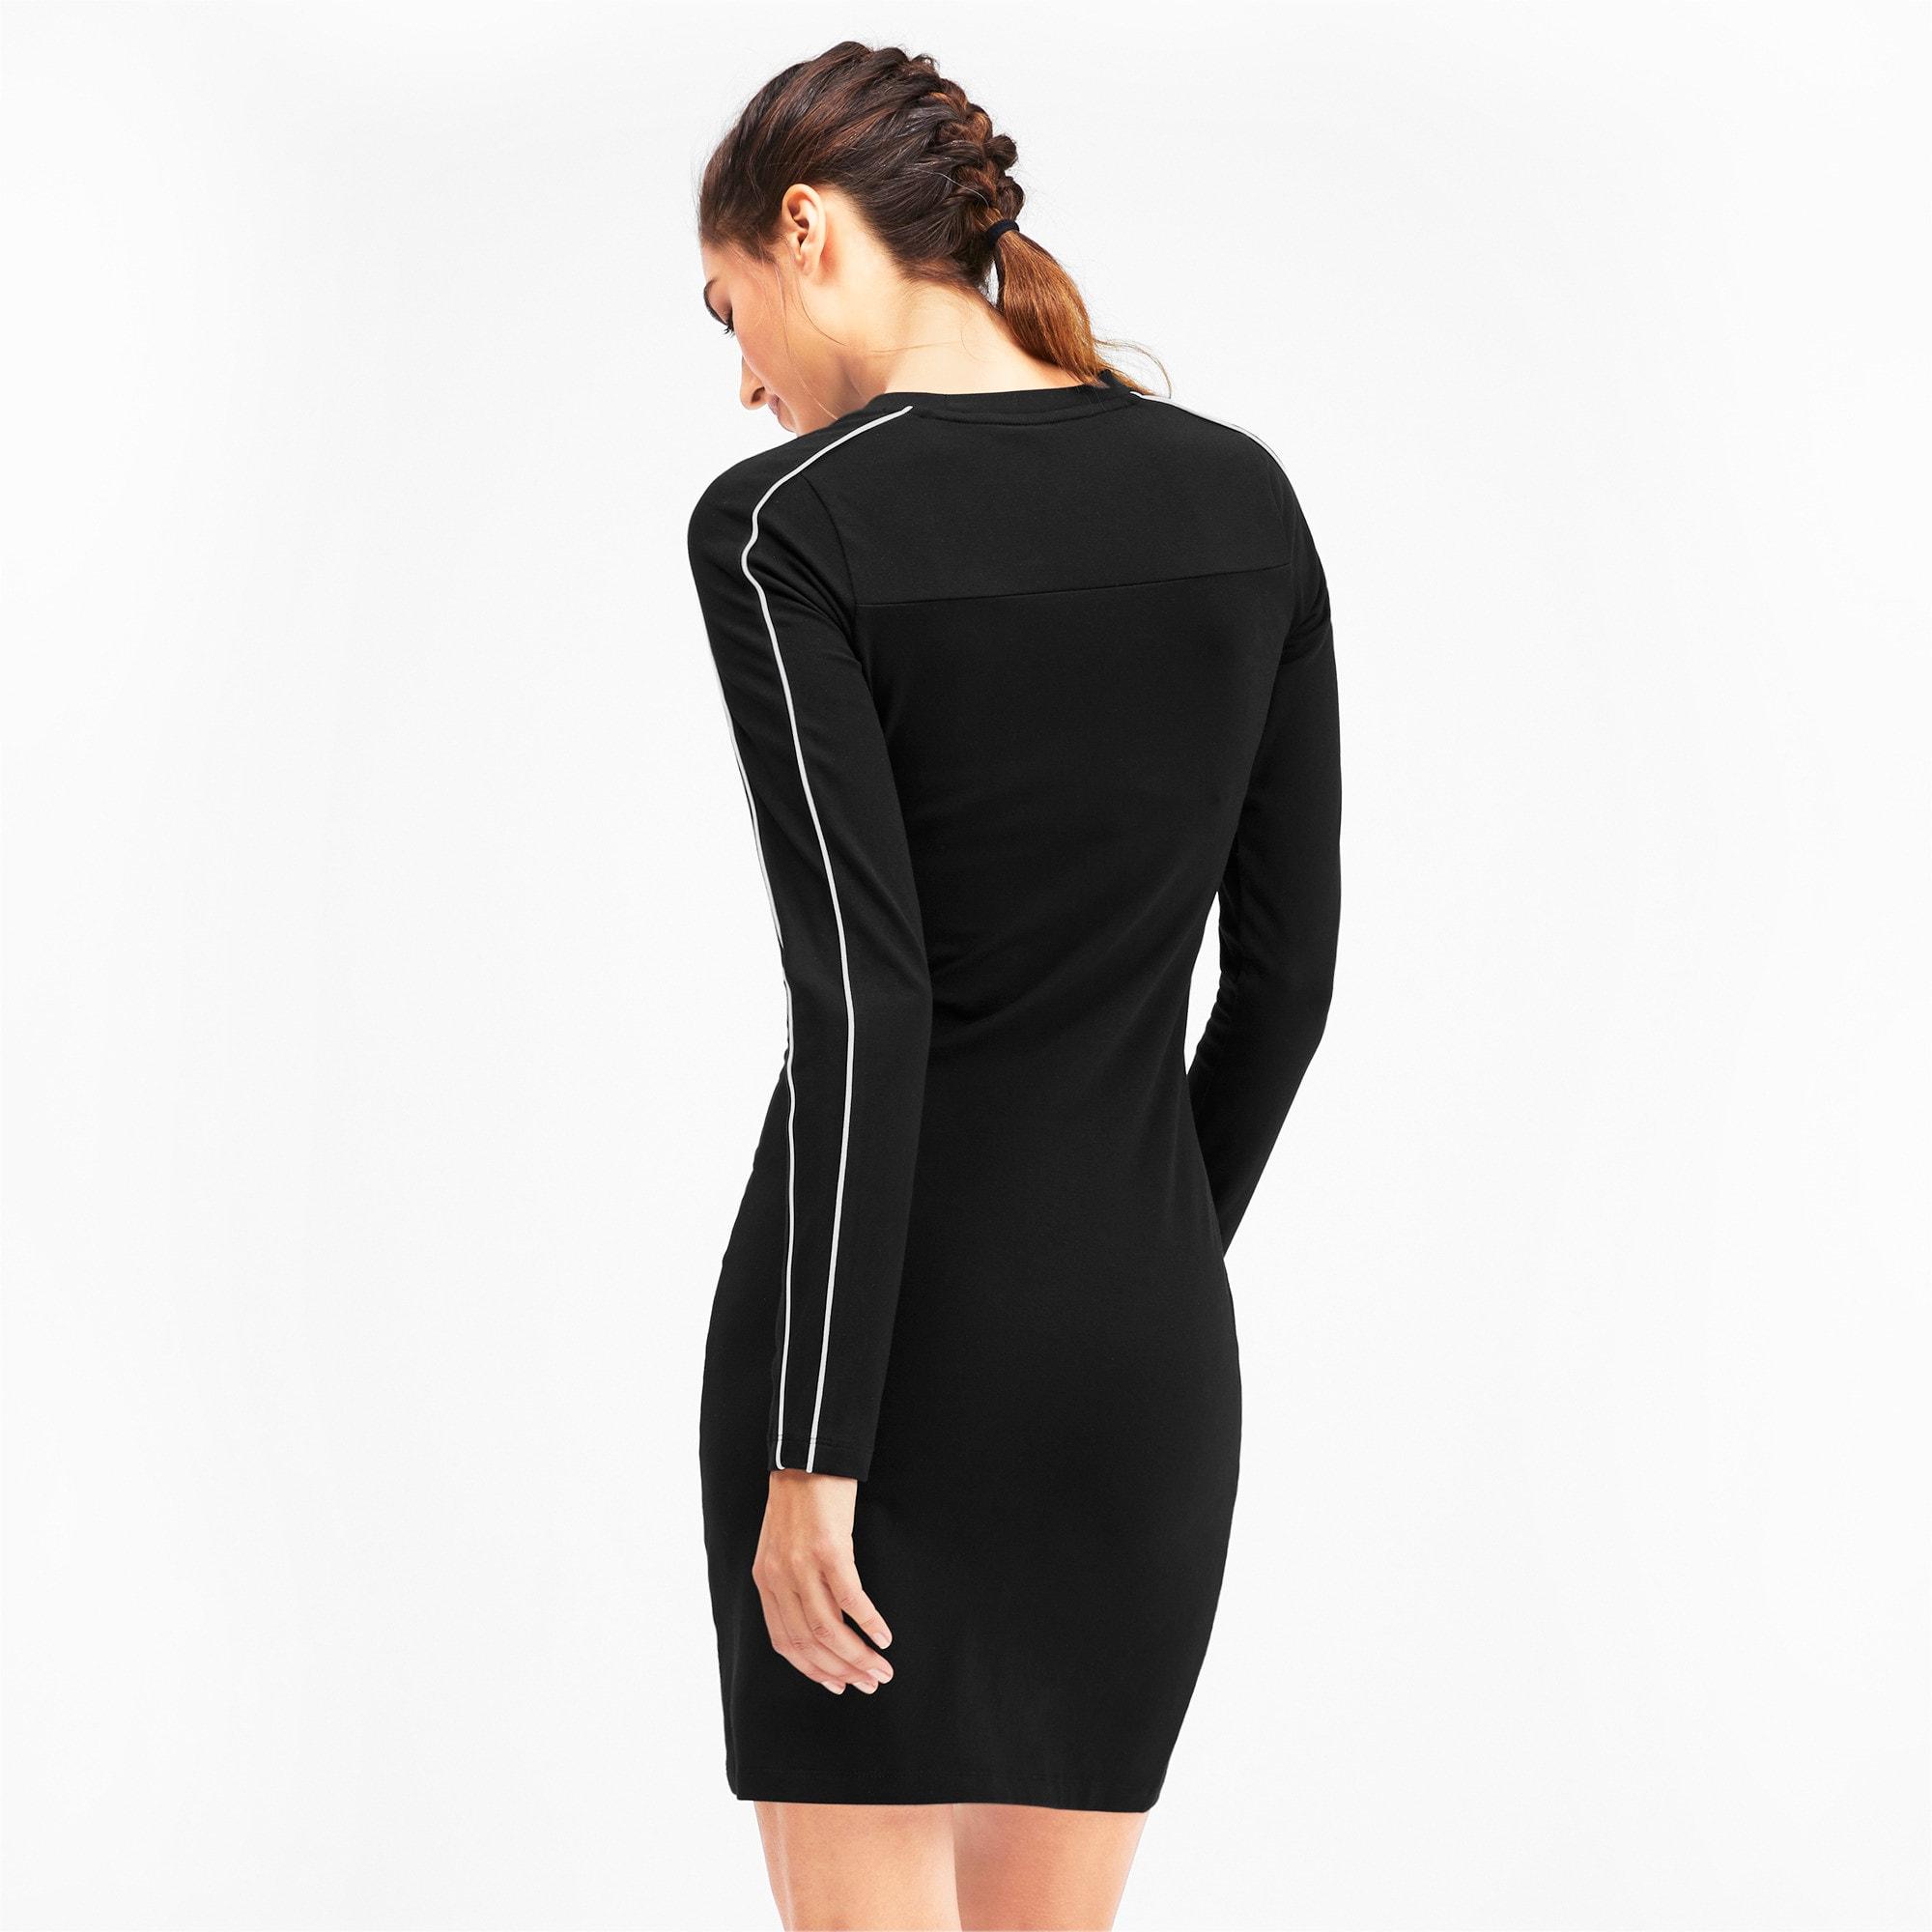 Thumbnail 3 of CLASSICS ウィメンズ ドレス, Cotton Black, medium-JPN